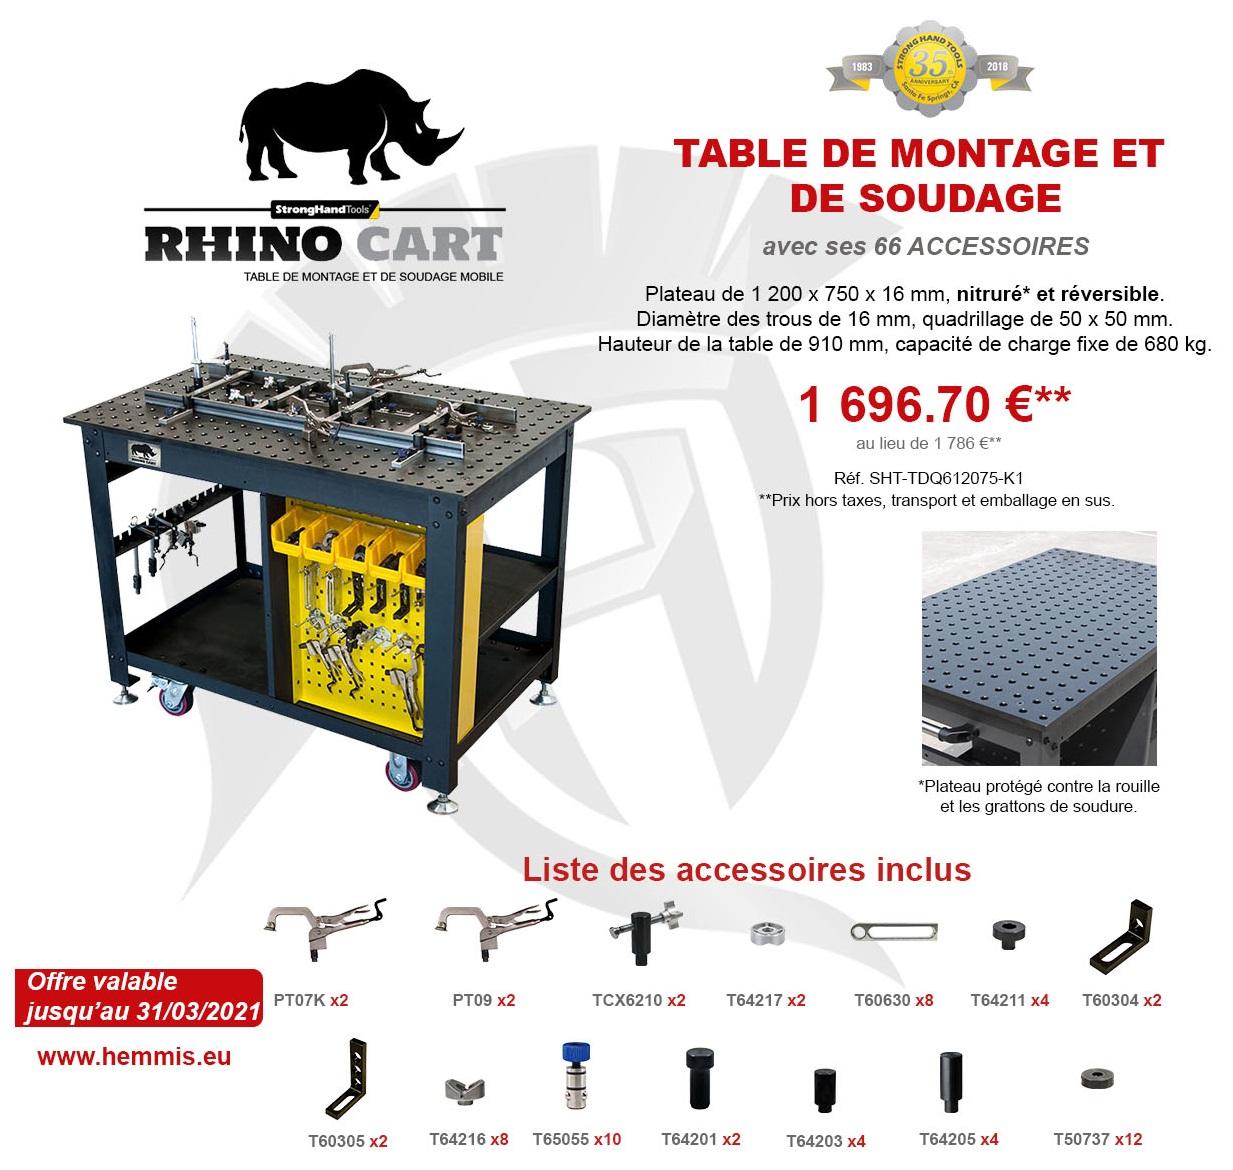 promotion Rhino Cart 1er trimestre